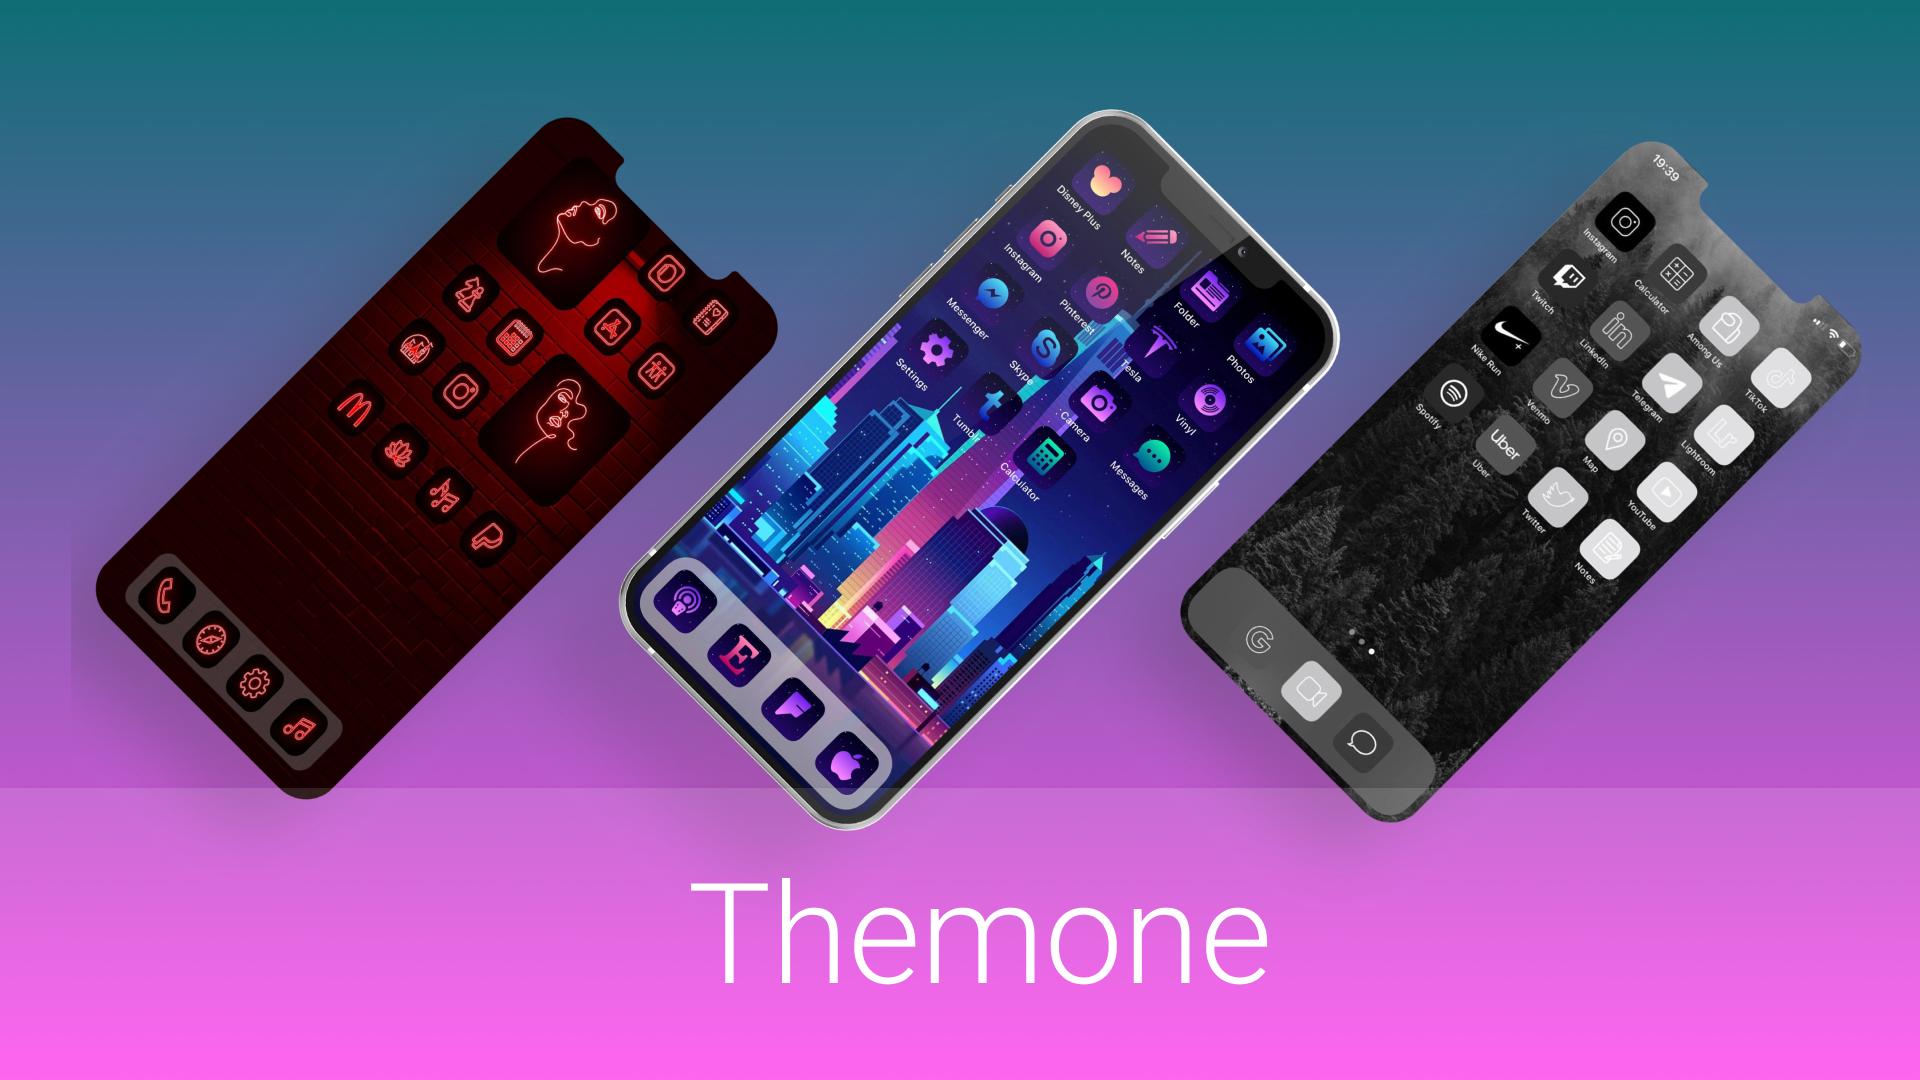 Themone - iOS customization app without jailbreak